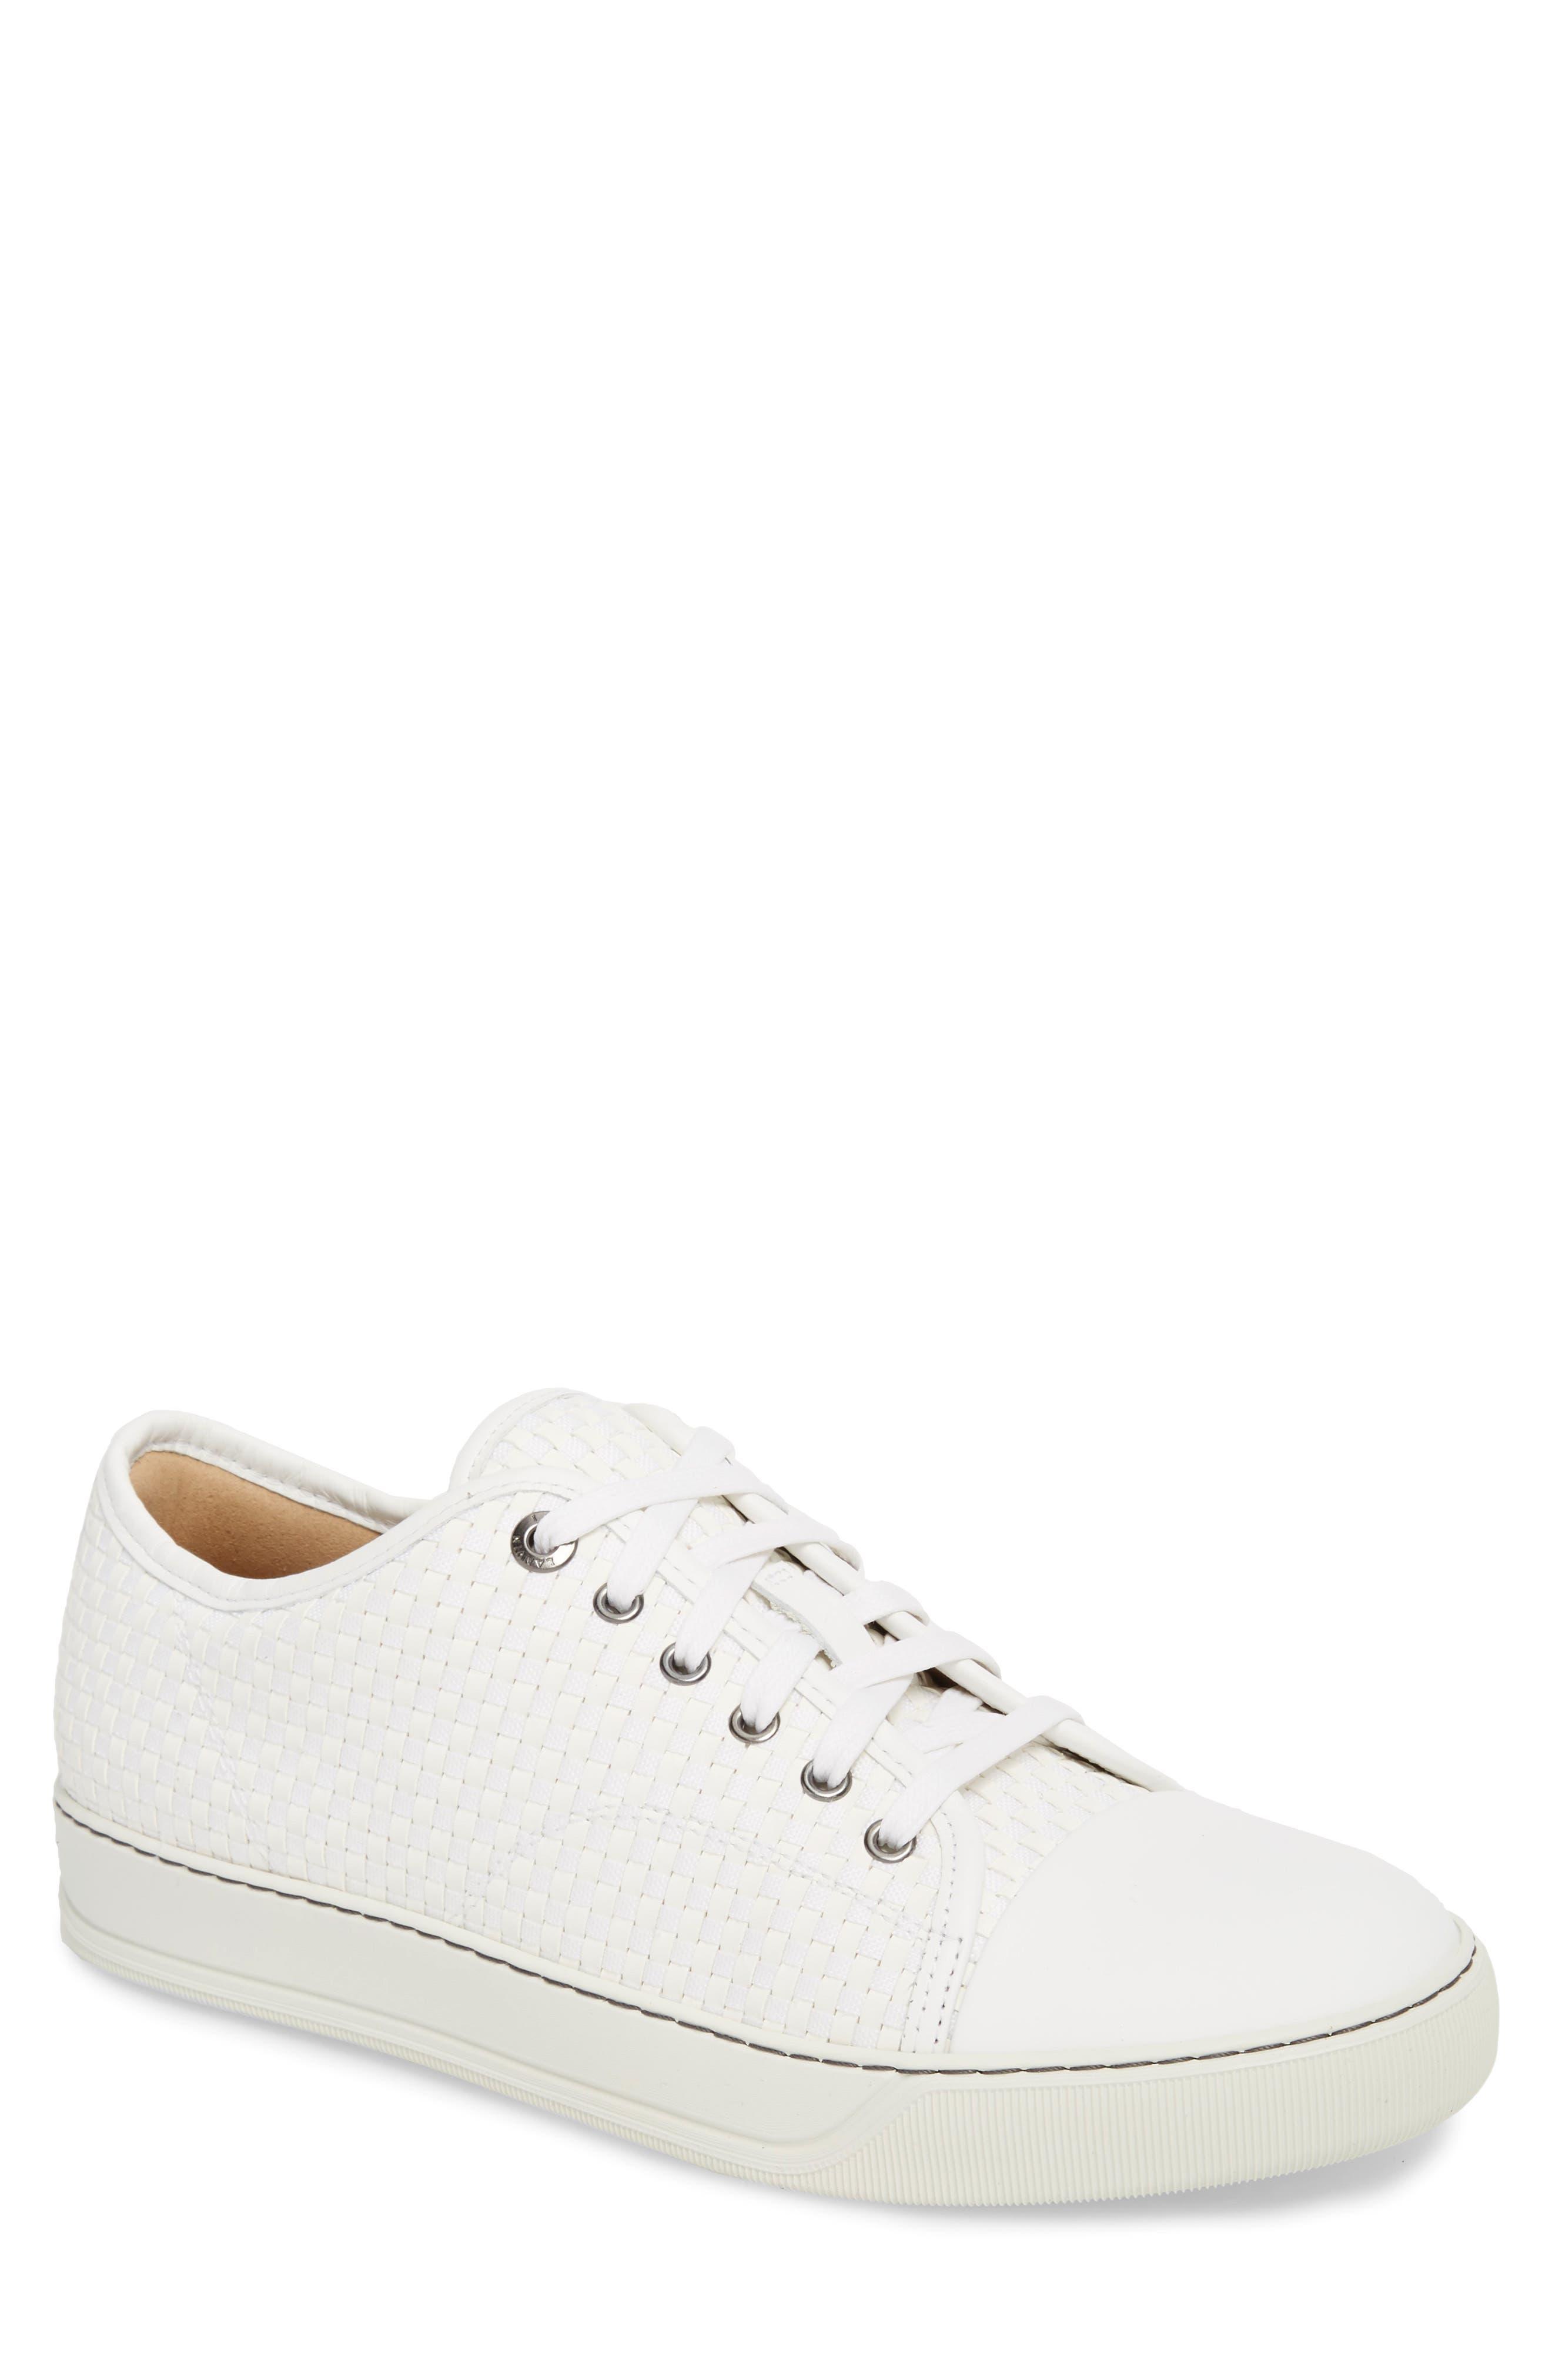 Lanvin Woven Low Top Sneaker (Men)